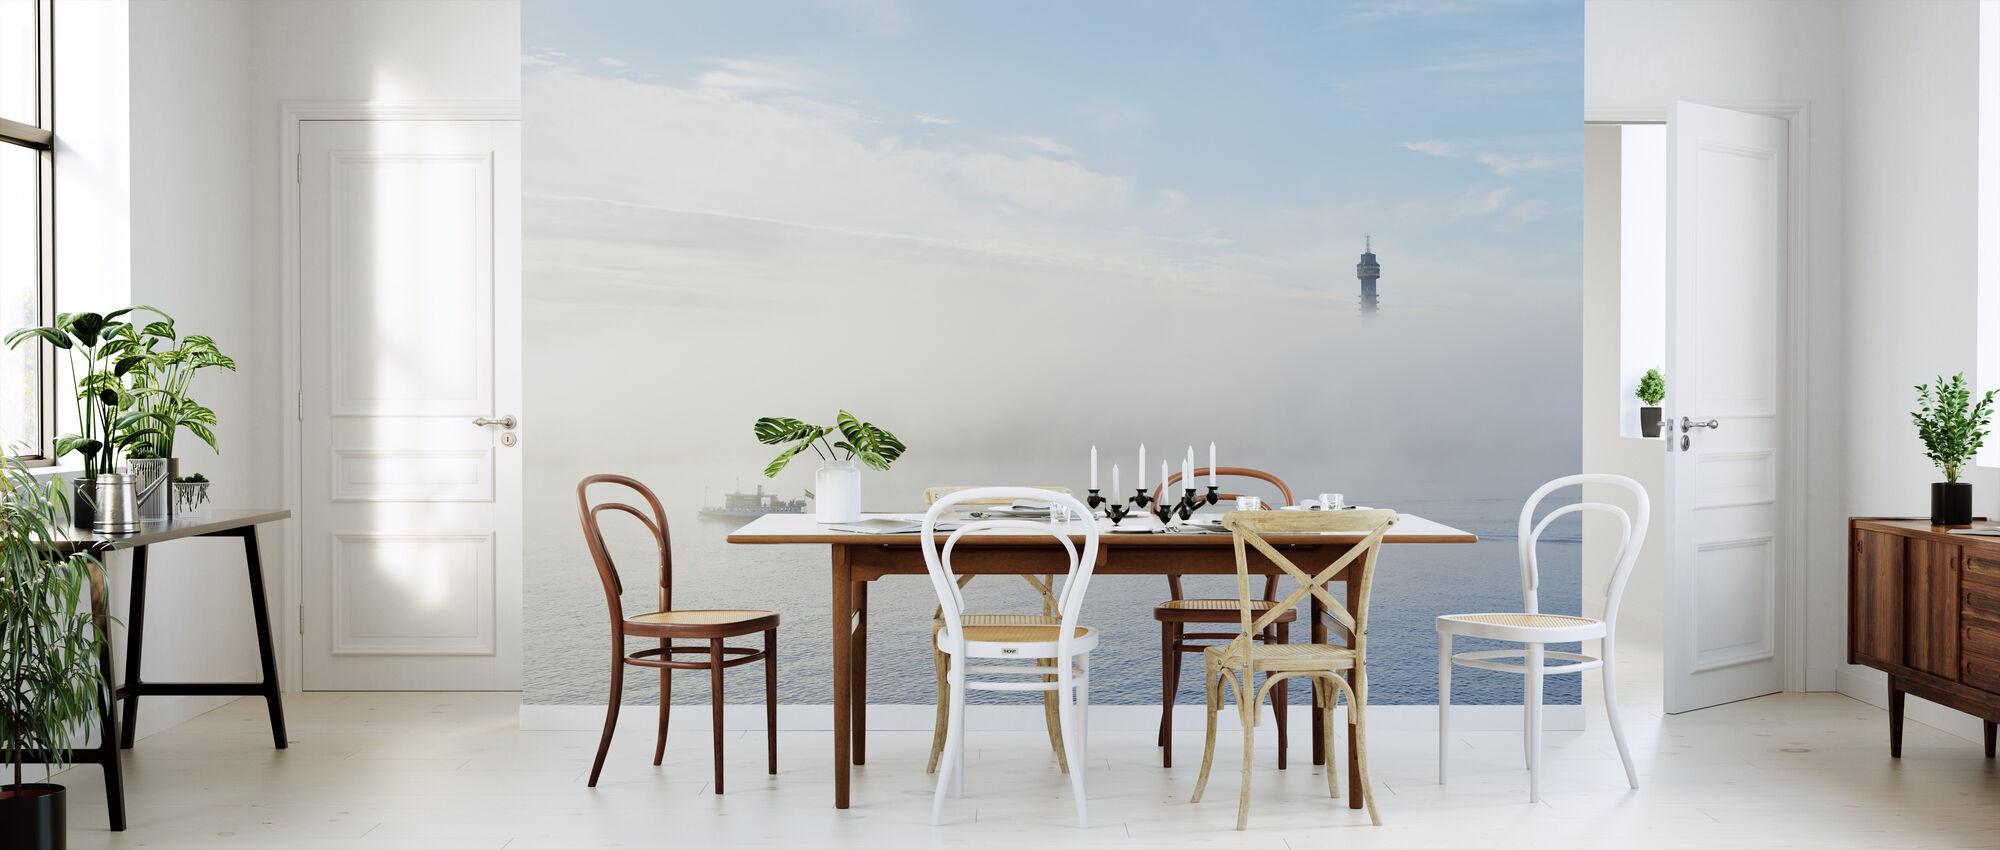 Misty Mañana en Estocolmo - Papel pintado - Cocina